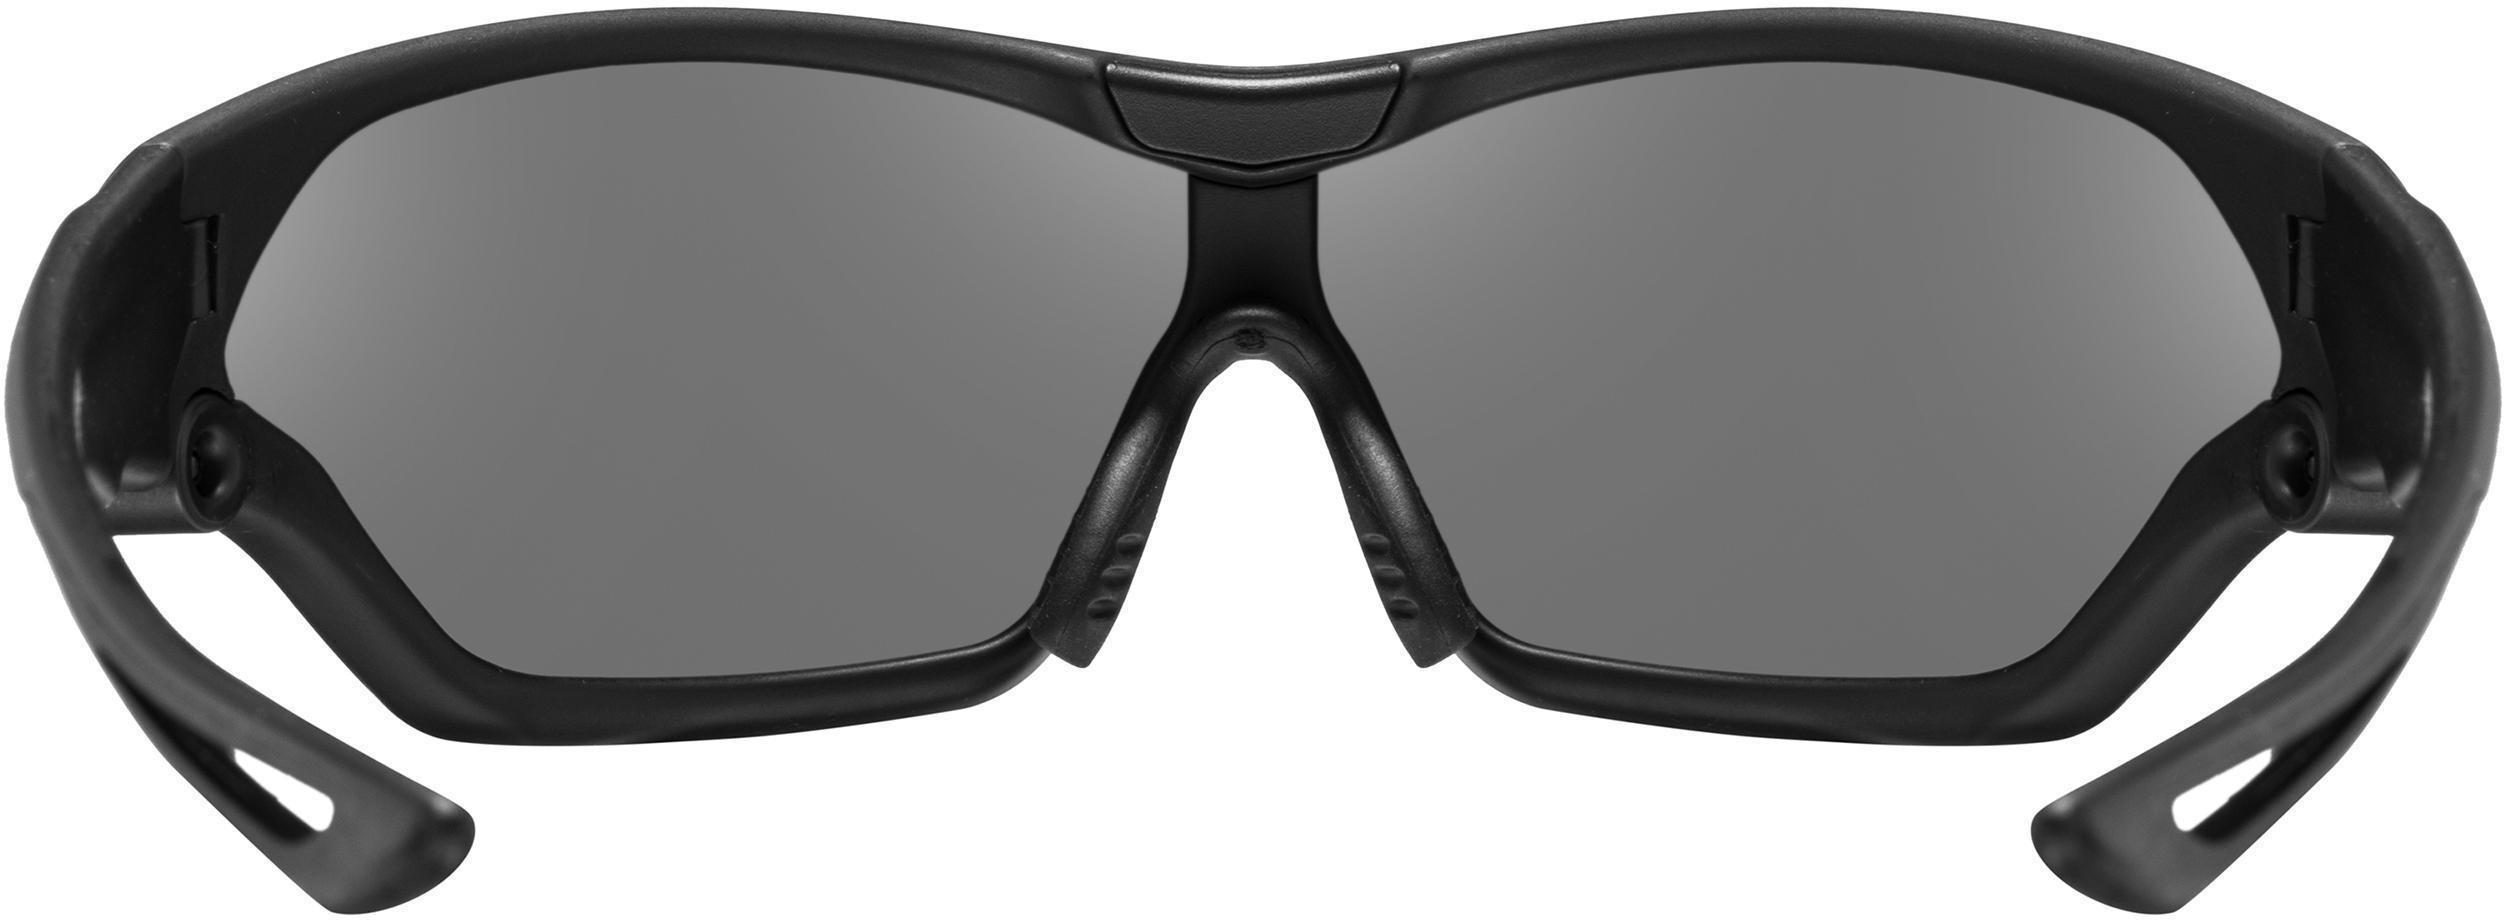 2b9c0c1f2b5 UVEX Sportstyle 705 Bike Glasses black at Addnature.co.uk